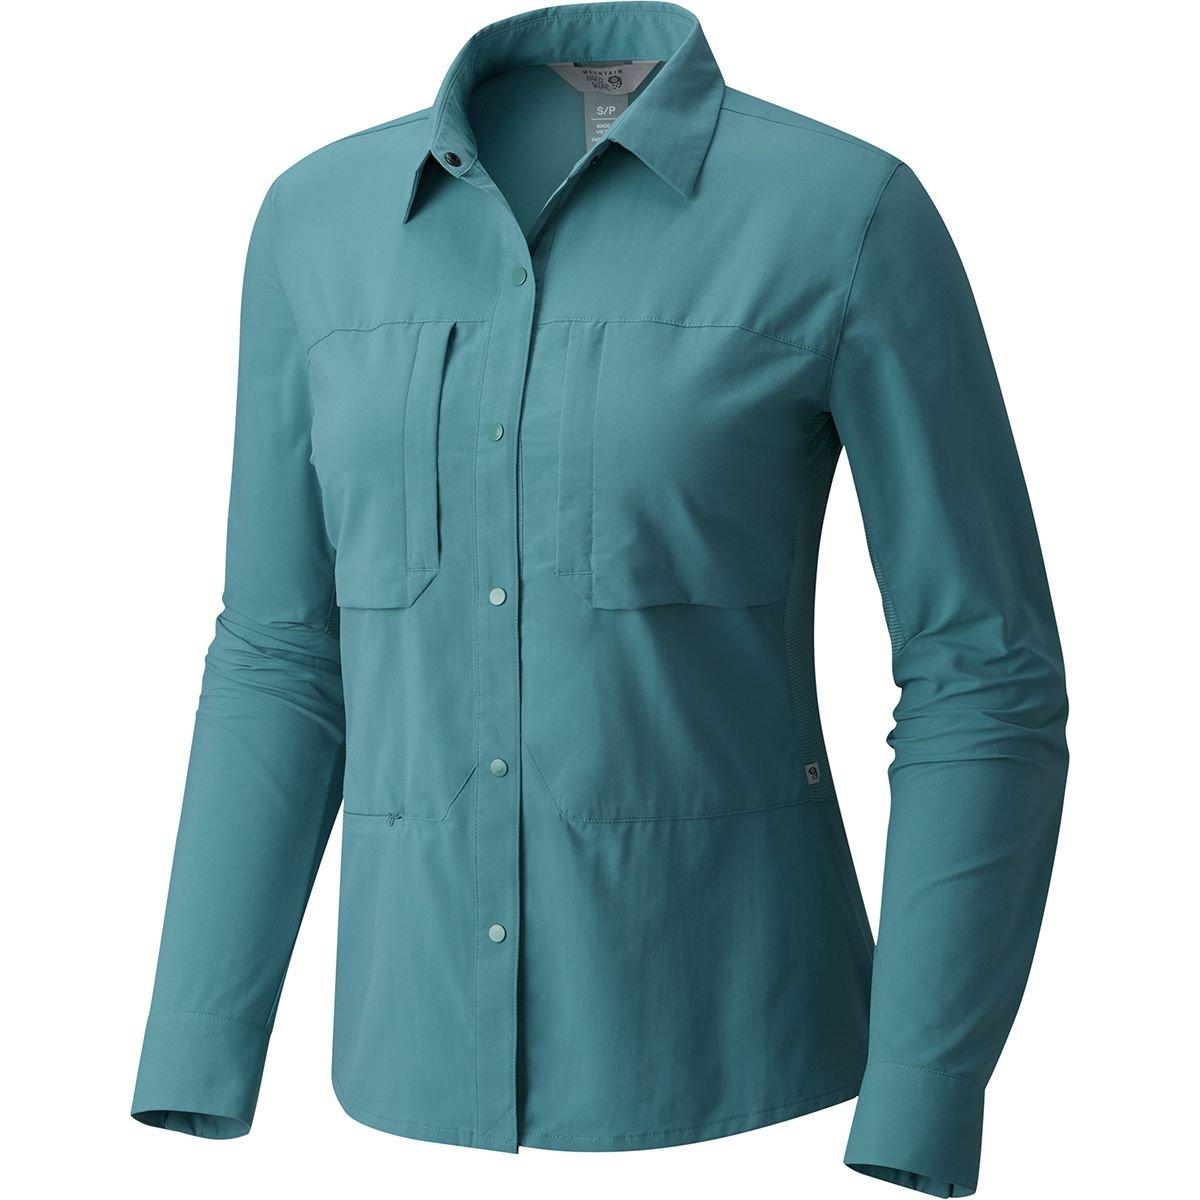 Mountain Hardwear SHIRT レディース B079RS42NC Large|Lakeshore Blue Lakeshore Blue Large